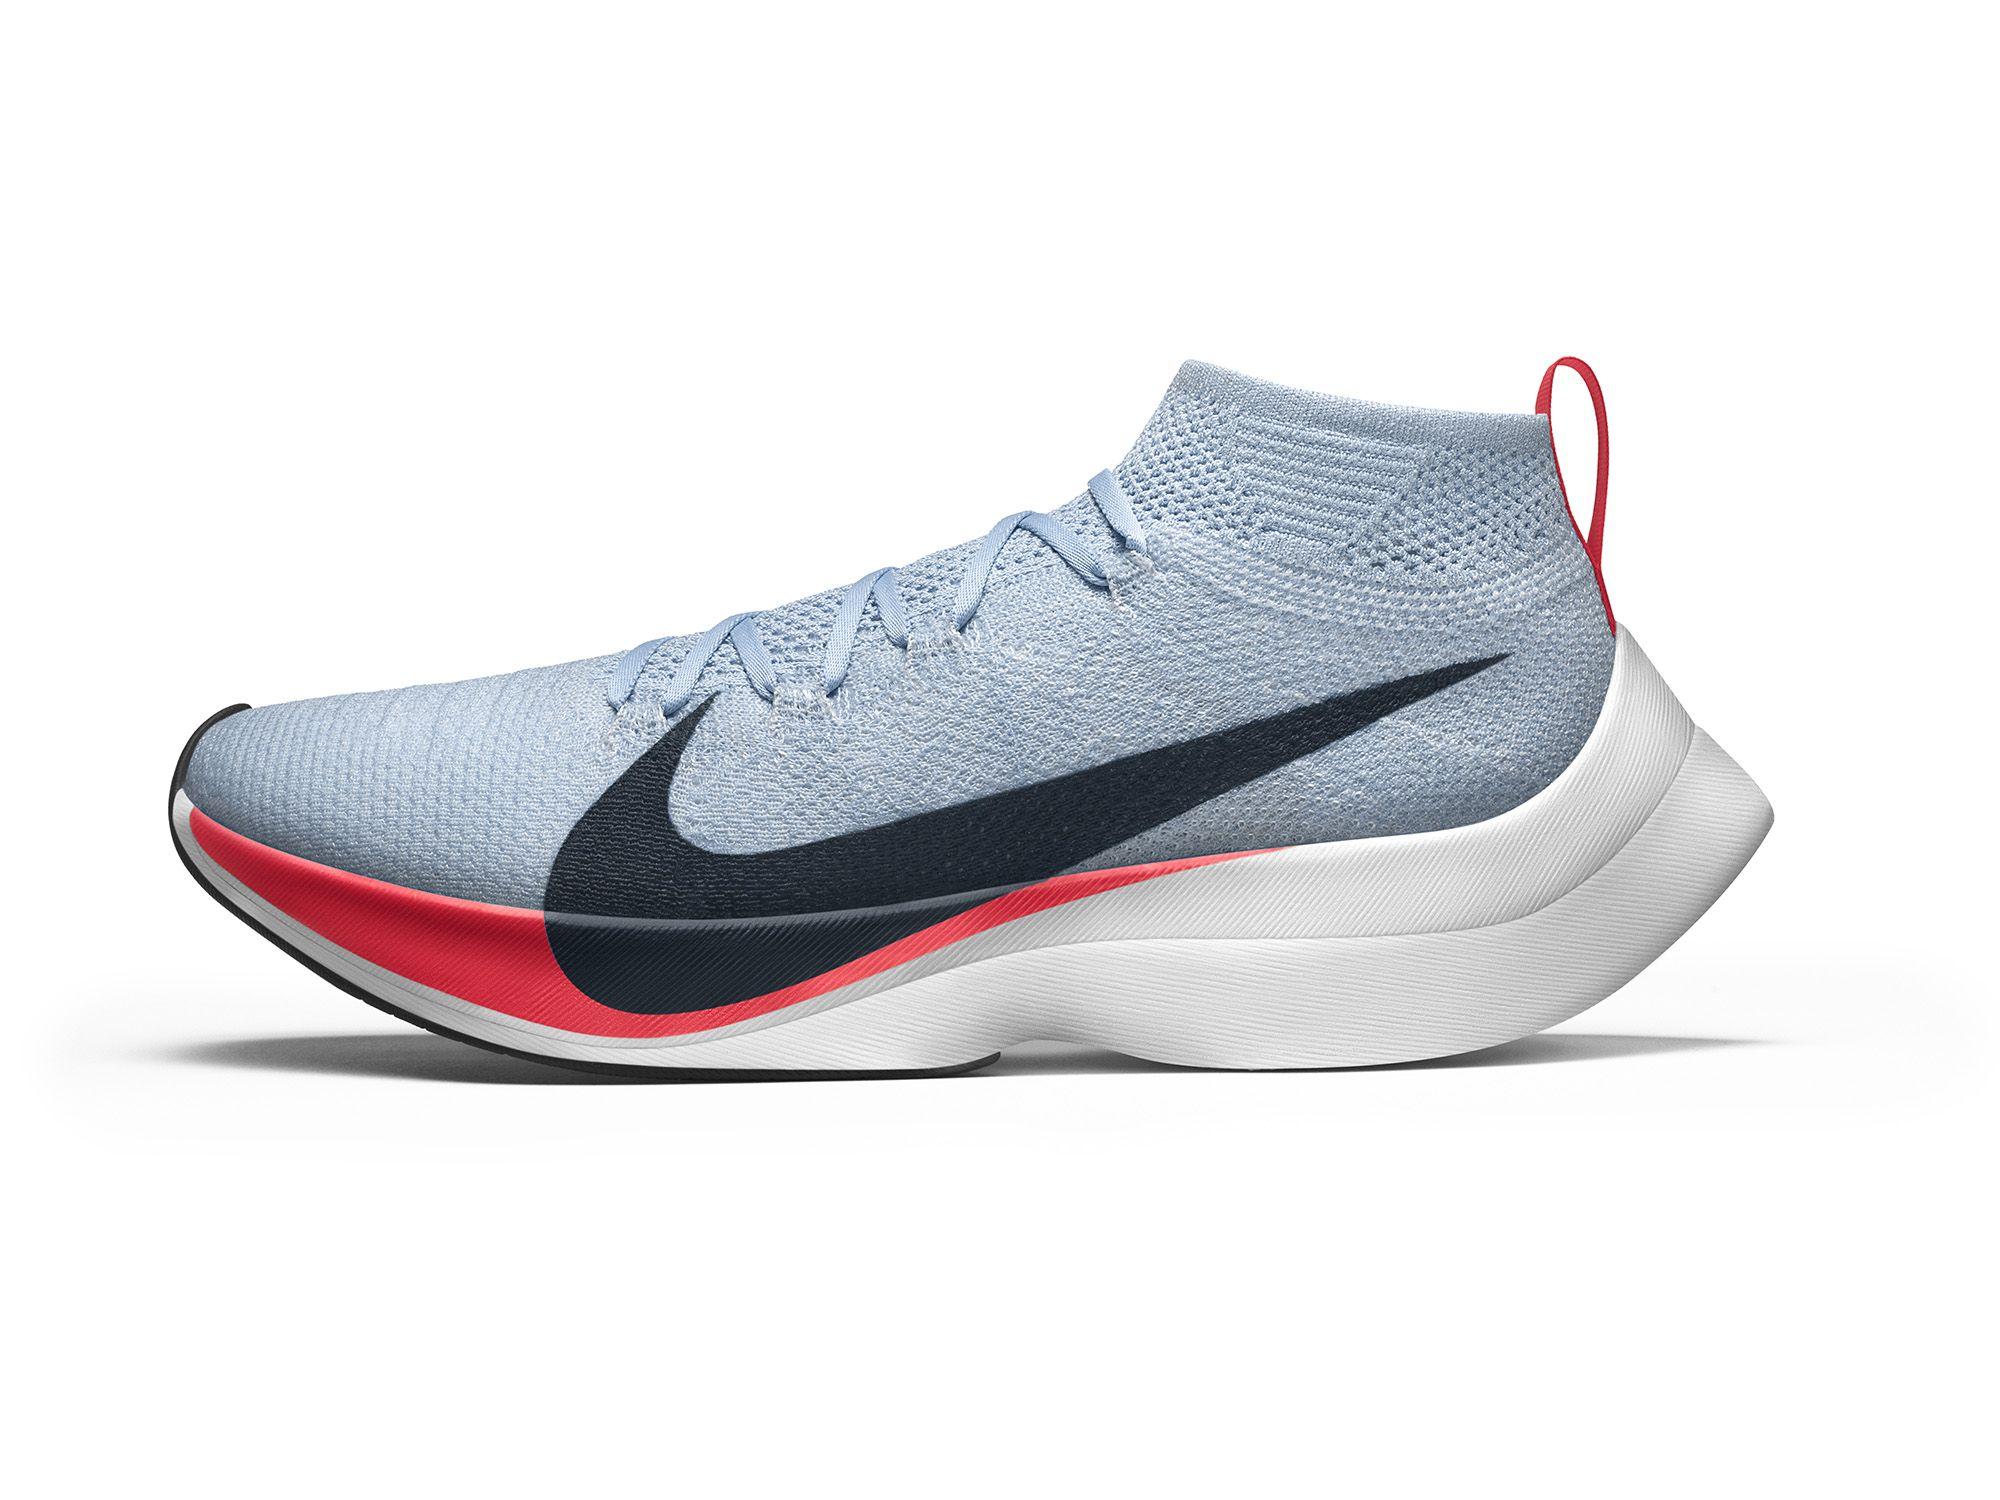 Exactamente Amedrentador Aplastar  Nike unveils Vaporfly elite for sub-two marathon | Latest nike shoes, Best  nike running shoes, Best running shoes